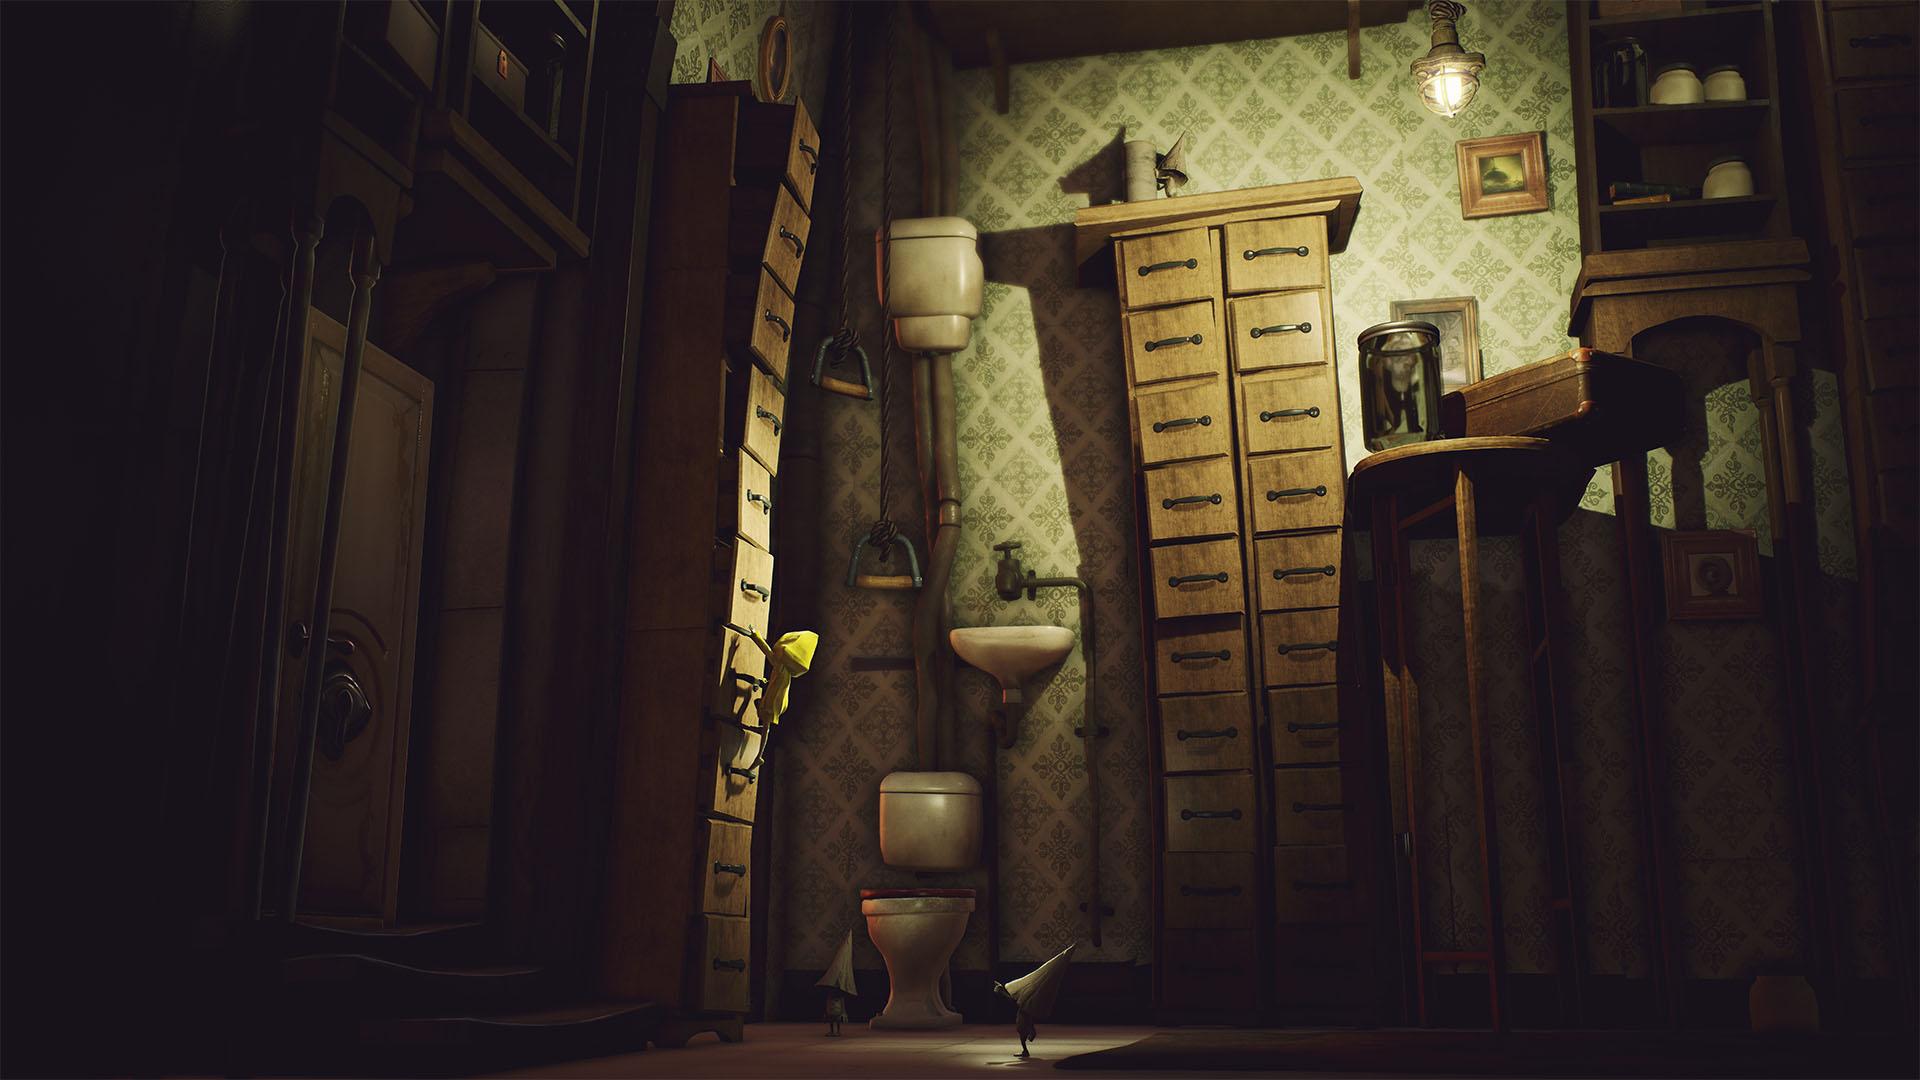 Little Nightmares startují pro PS4, Xbox One a PC na jaře 2017 128873